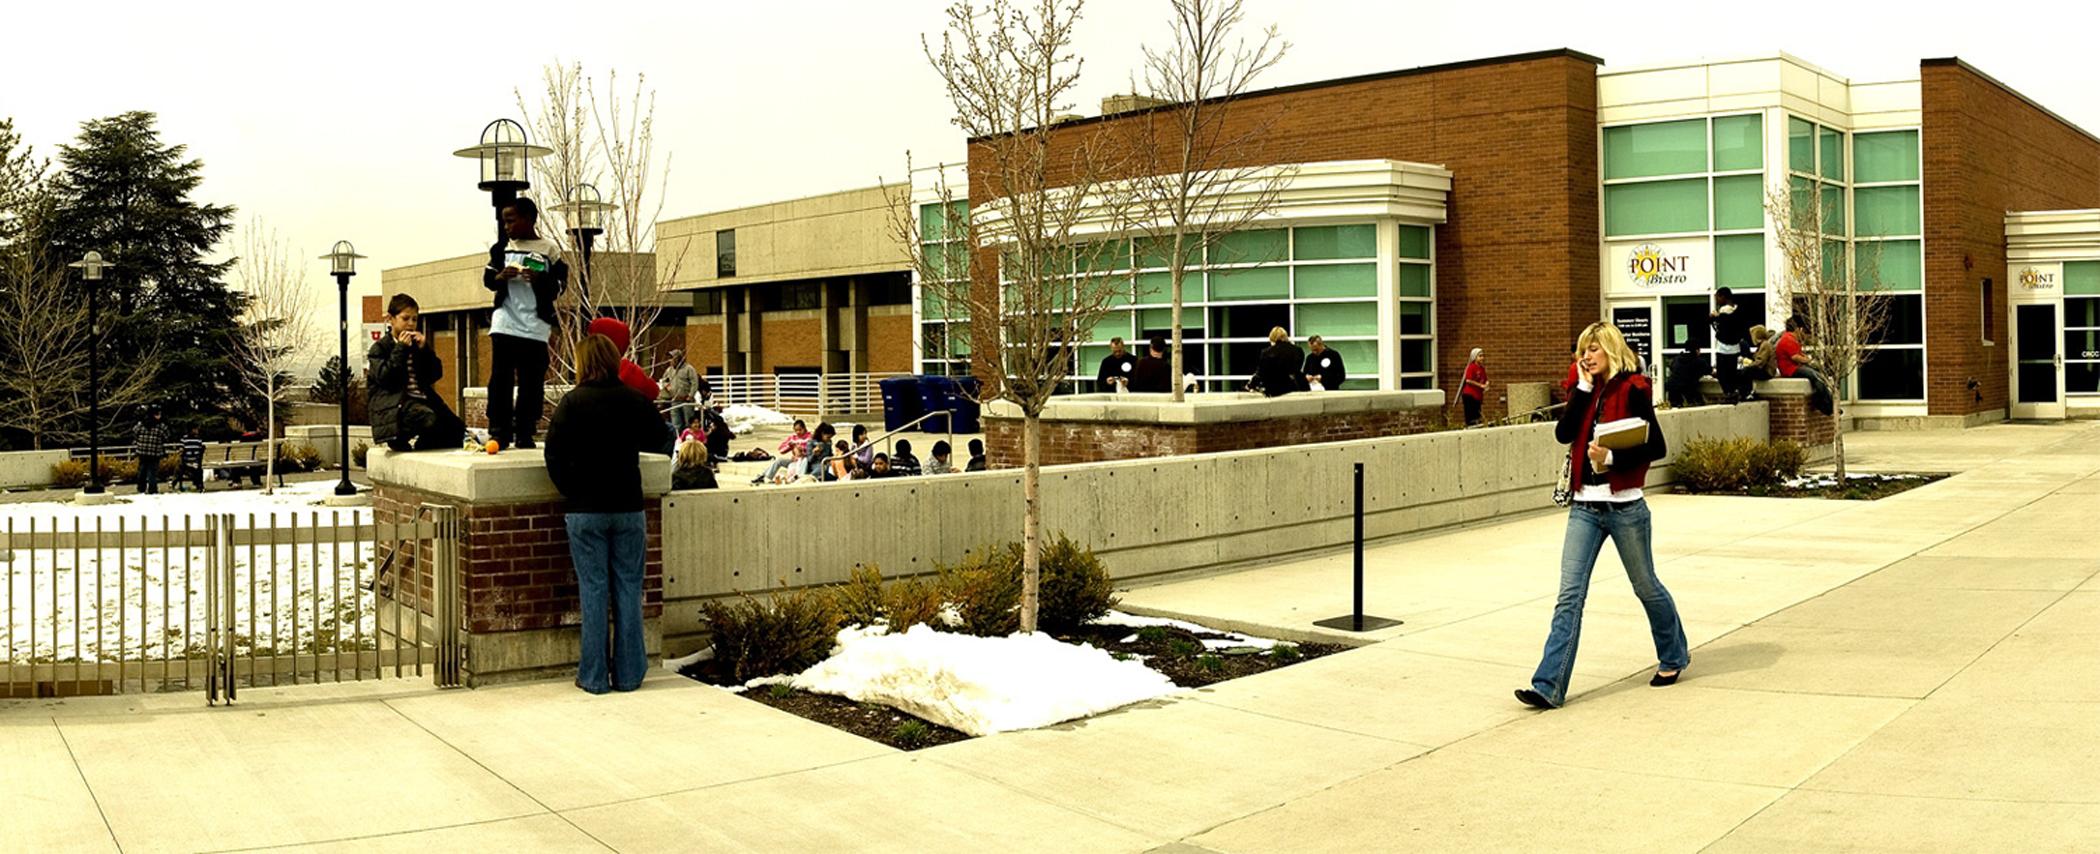 David Eccles School of Business exterior.